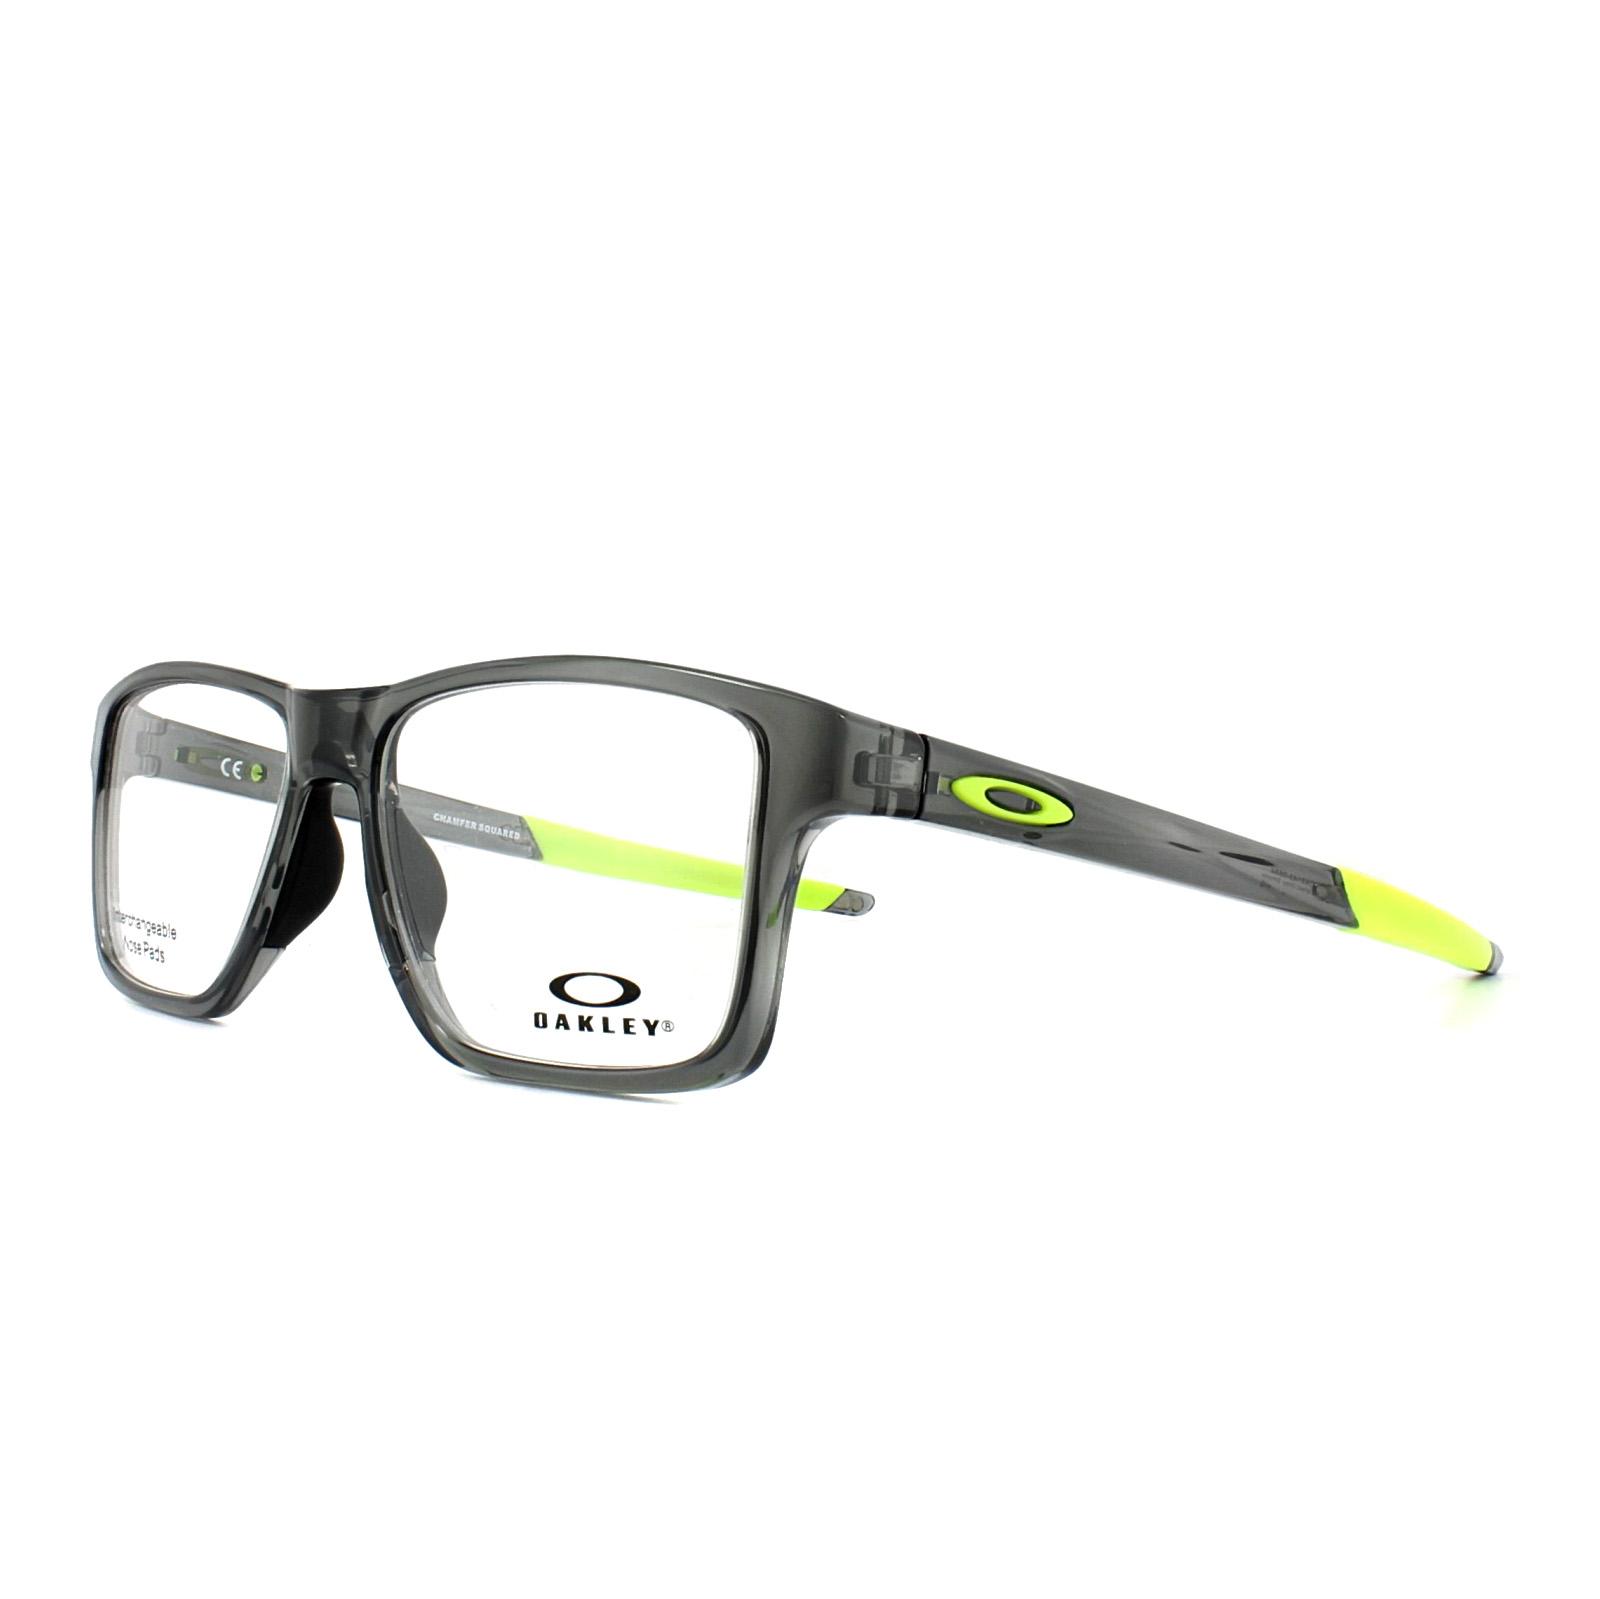 16877dd613a0 Cheap Oakley Chamfer Squared Glasses Frames - Discounted Sunglasses